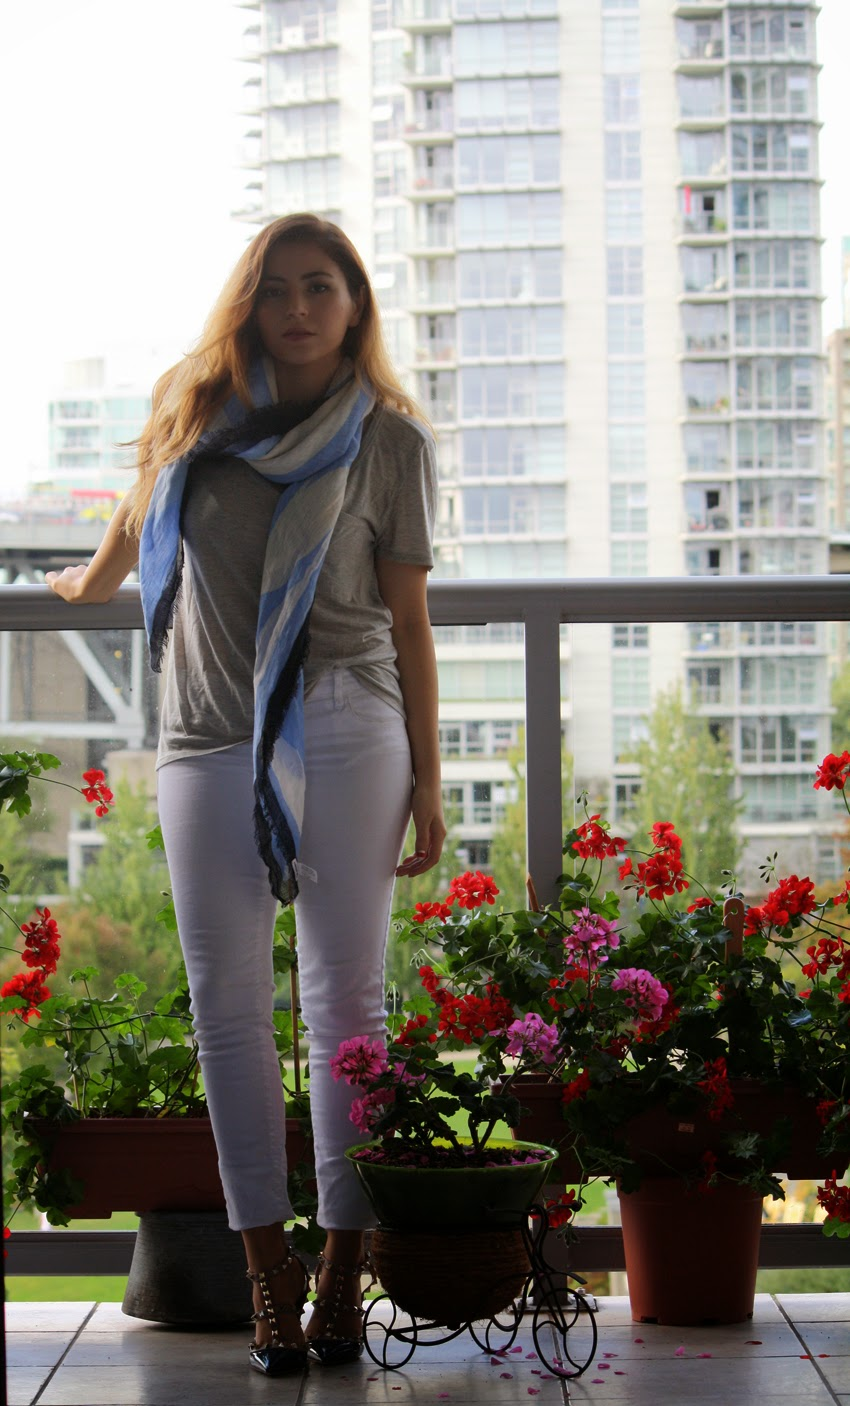 valentino-rockstud-slingbacks-clubmonaco-ae-jeans-basics